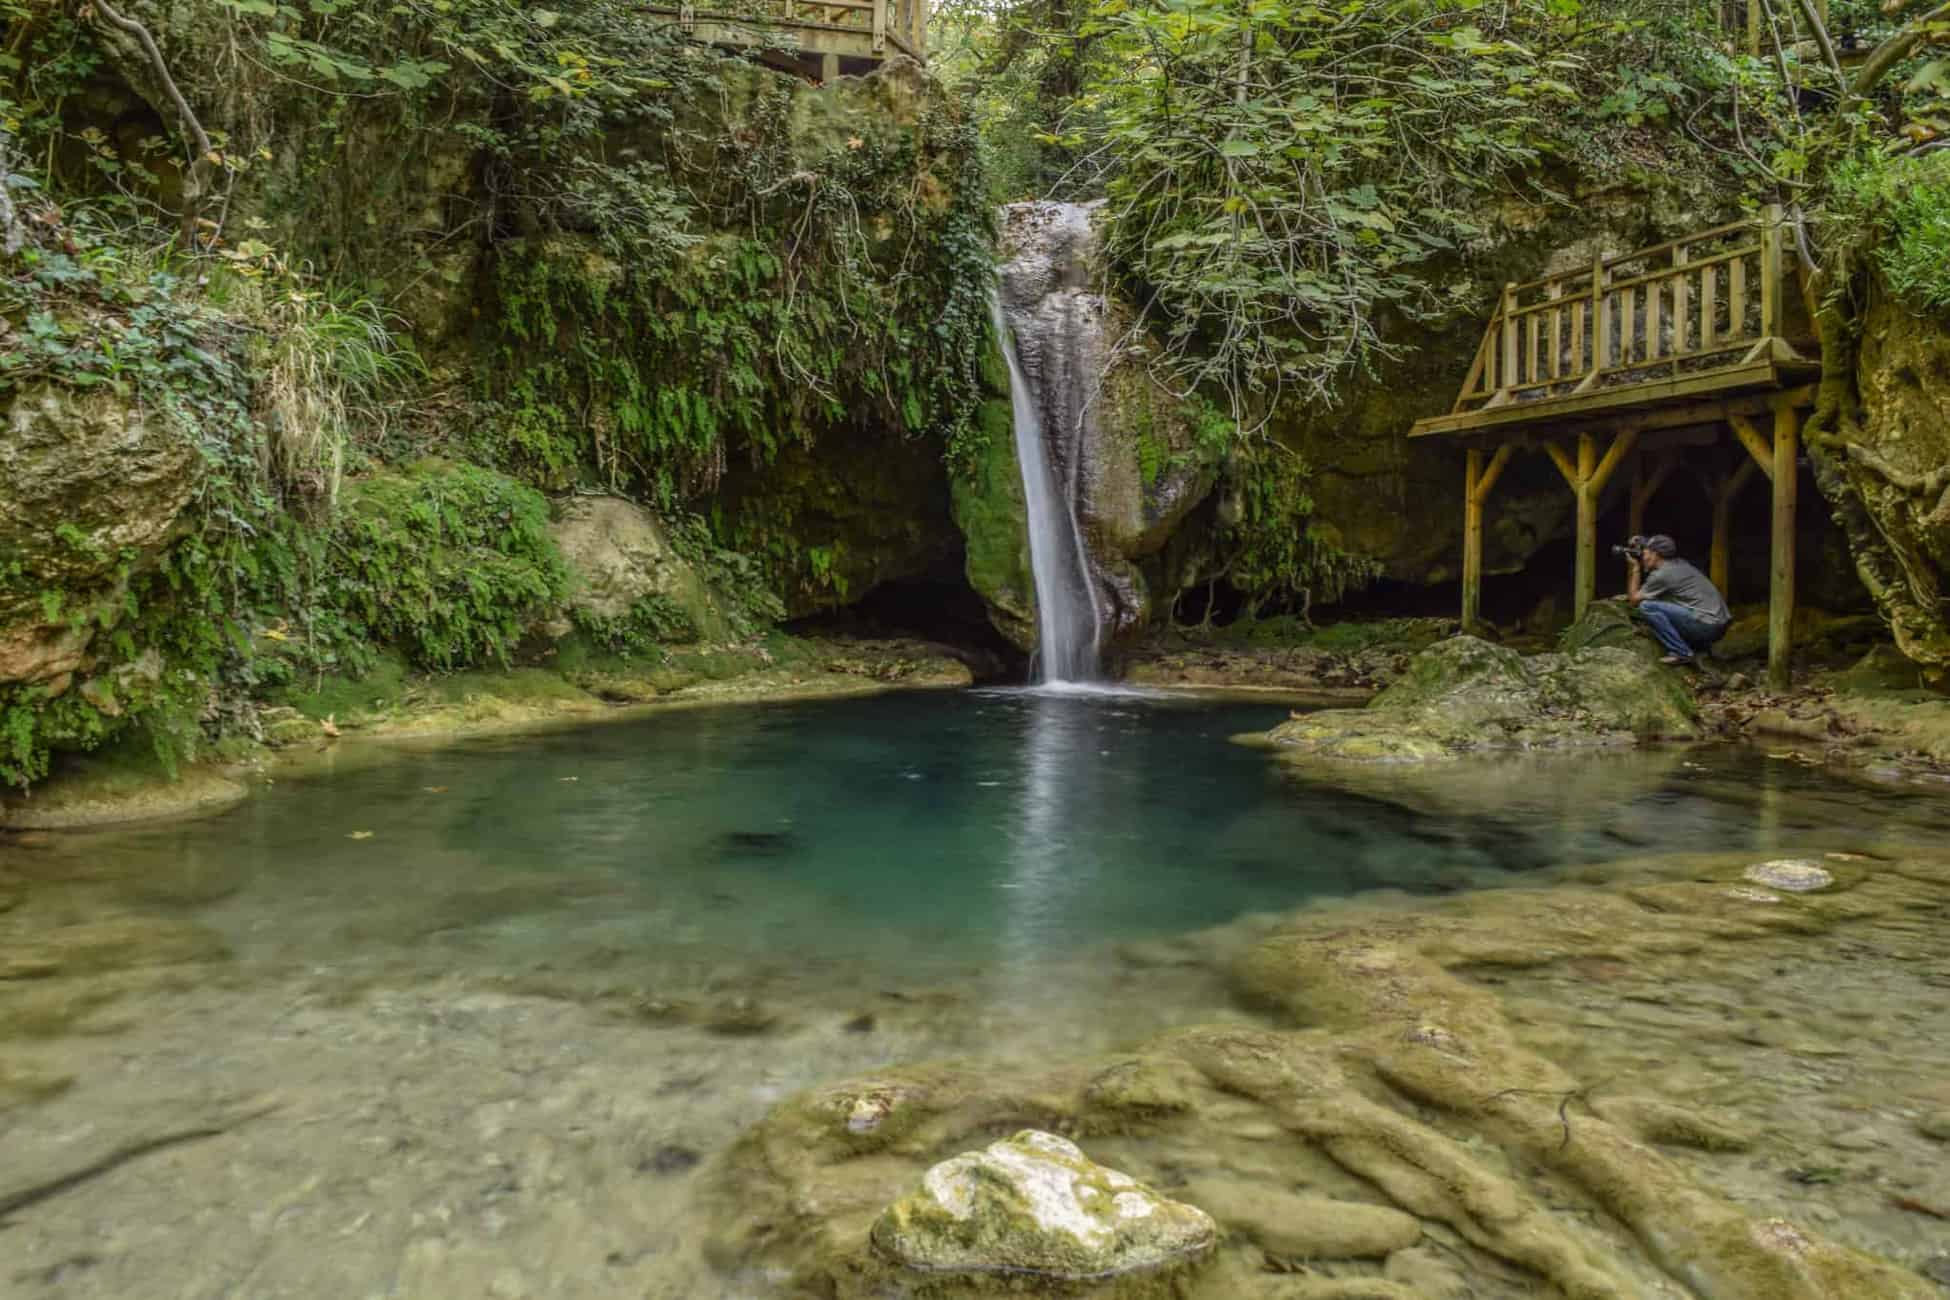 Visit Akyaka and see the Turgot Waterfall nearby